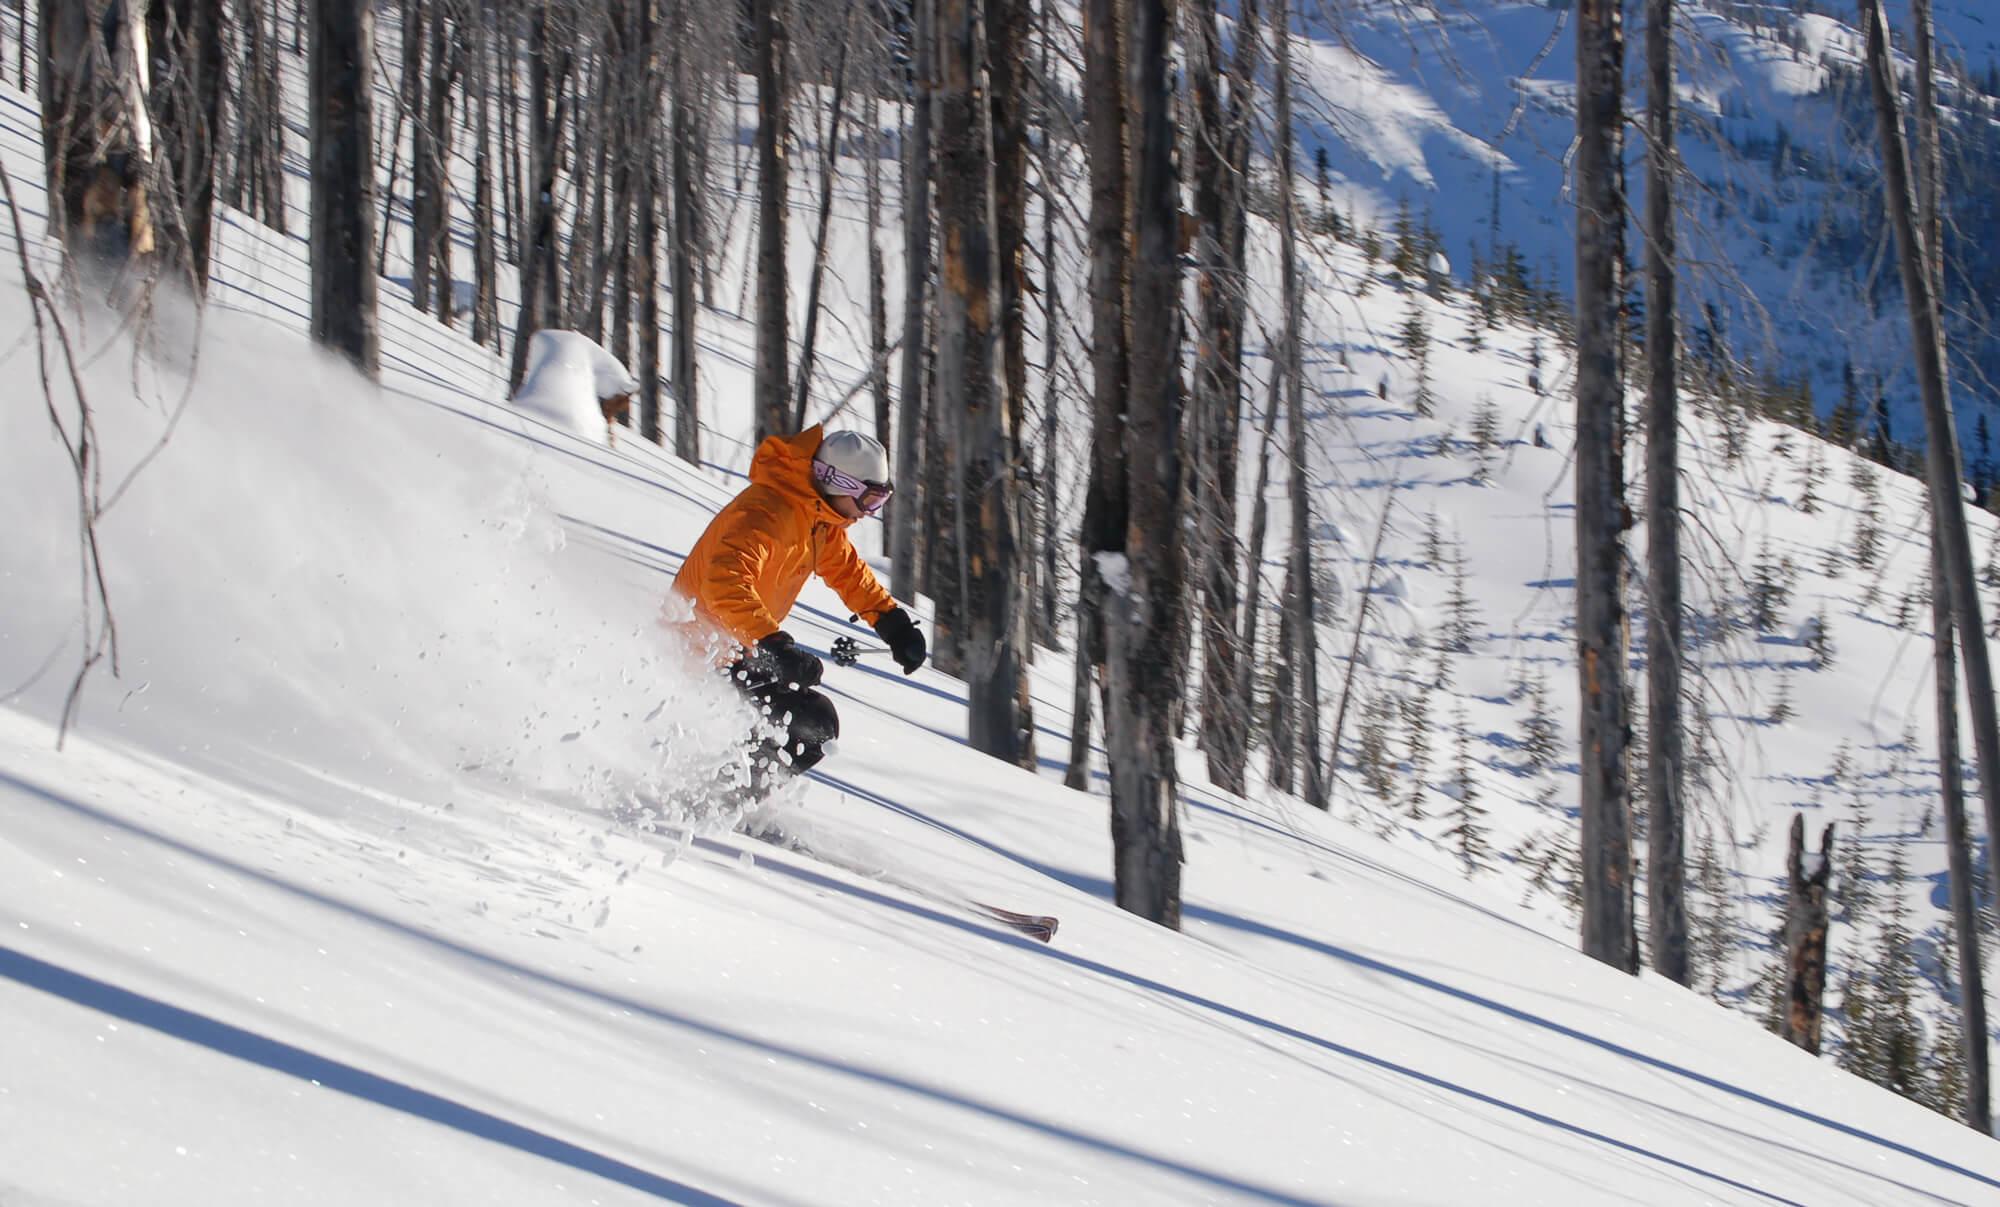 Tree powder skier